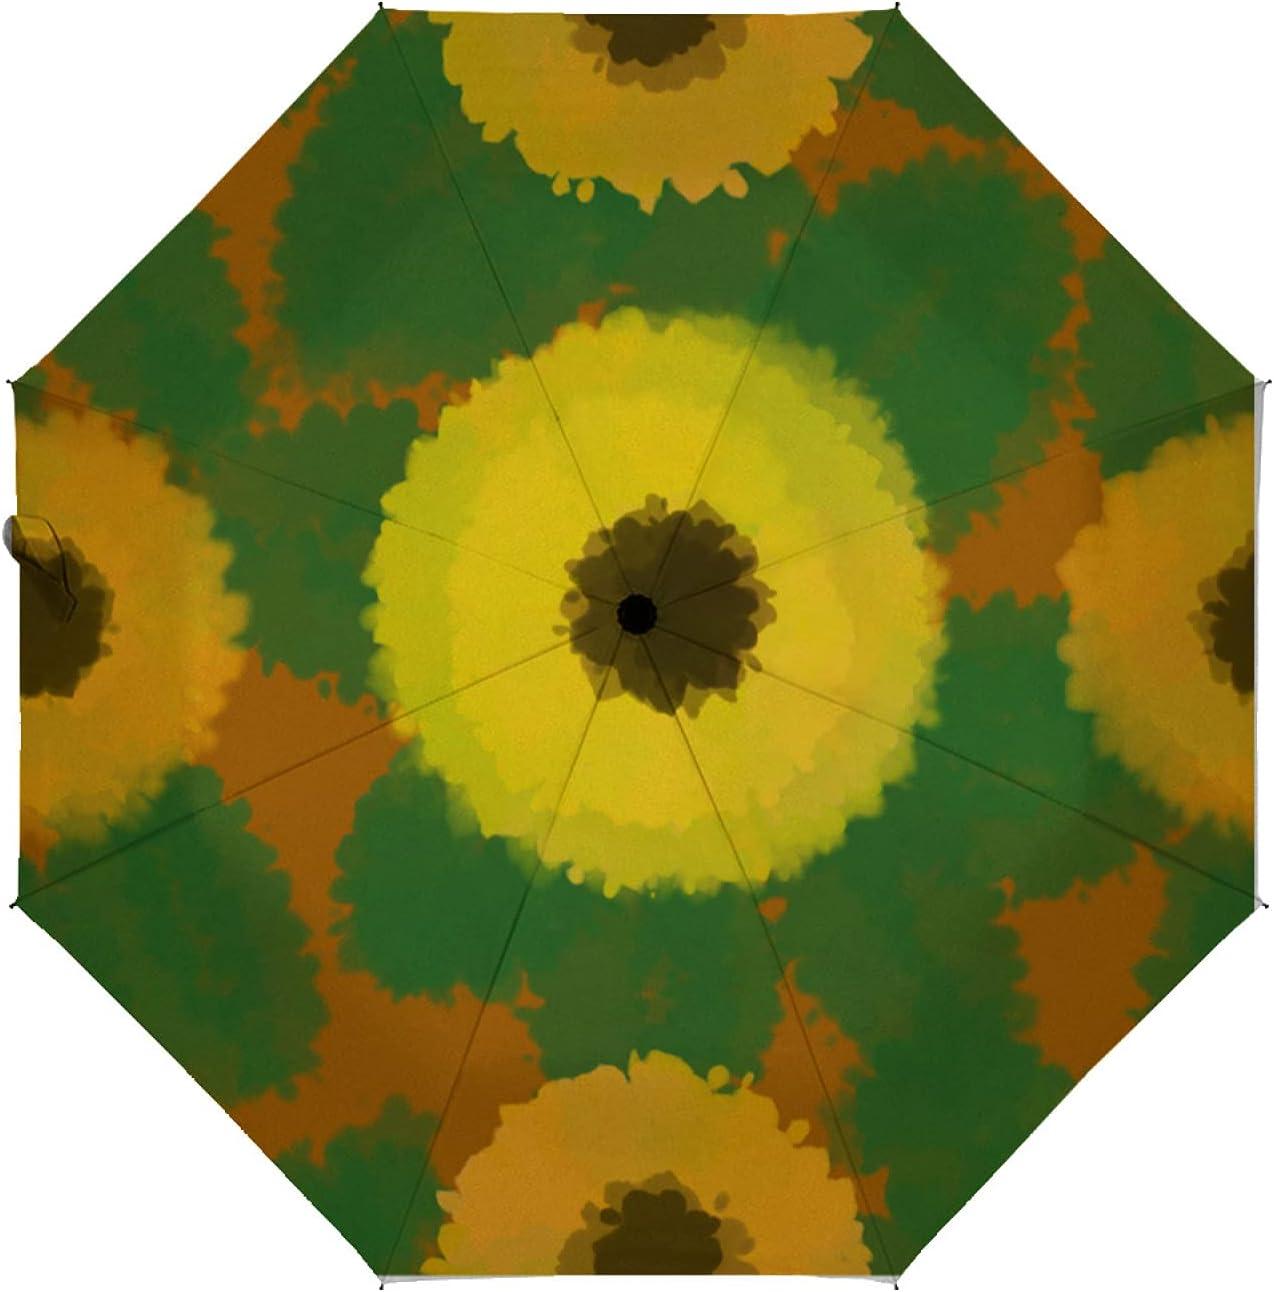 depot Courier shipping free shipping ZXZNC Compact Umbrella Watercolor Splash Green Au Tie Dye Yellow